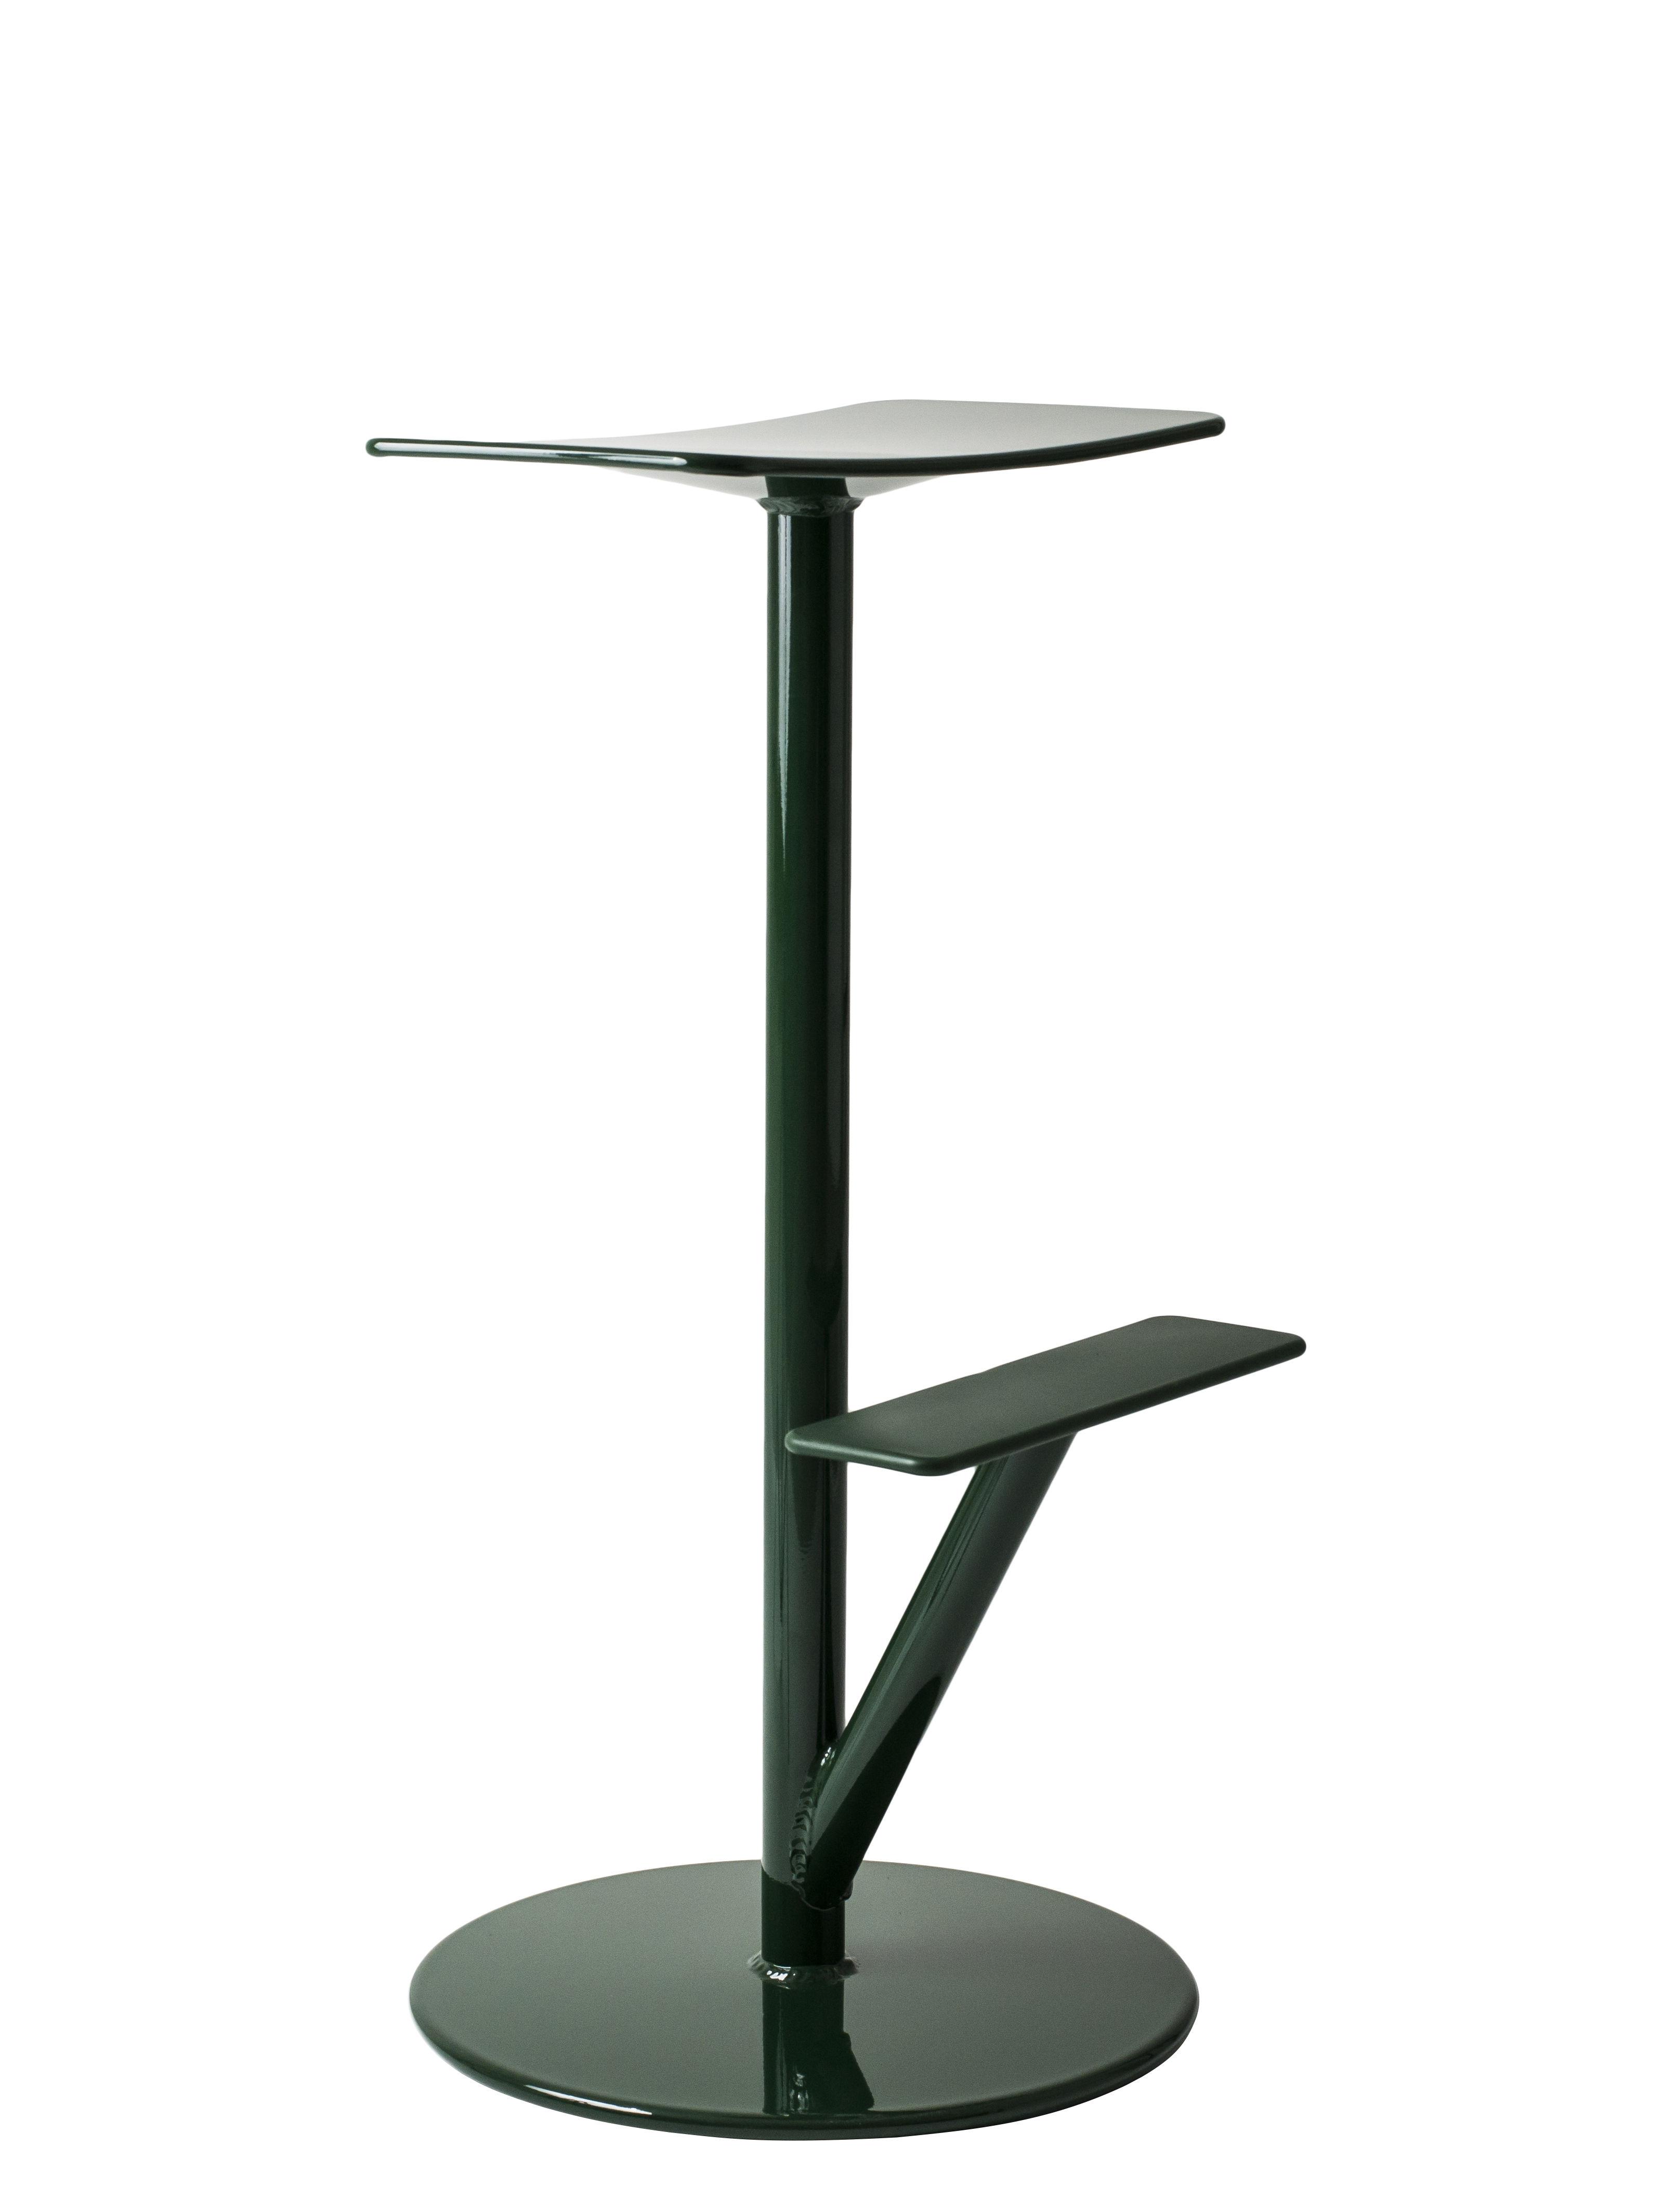 Möbel - Barhocker - Sequoia Barhocker / Metall - H 76 cm - Magis - Dunkelgrün - Stahl